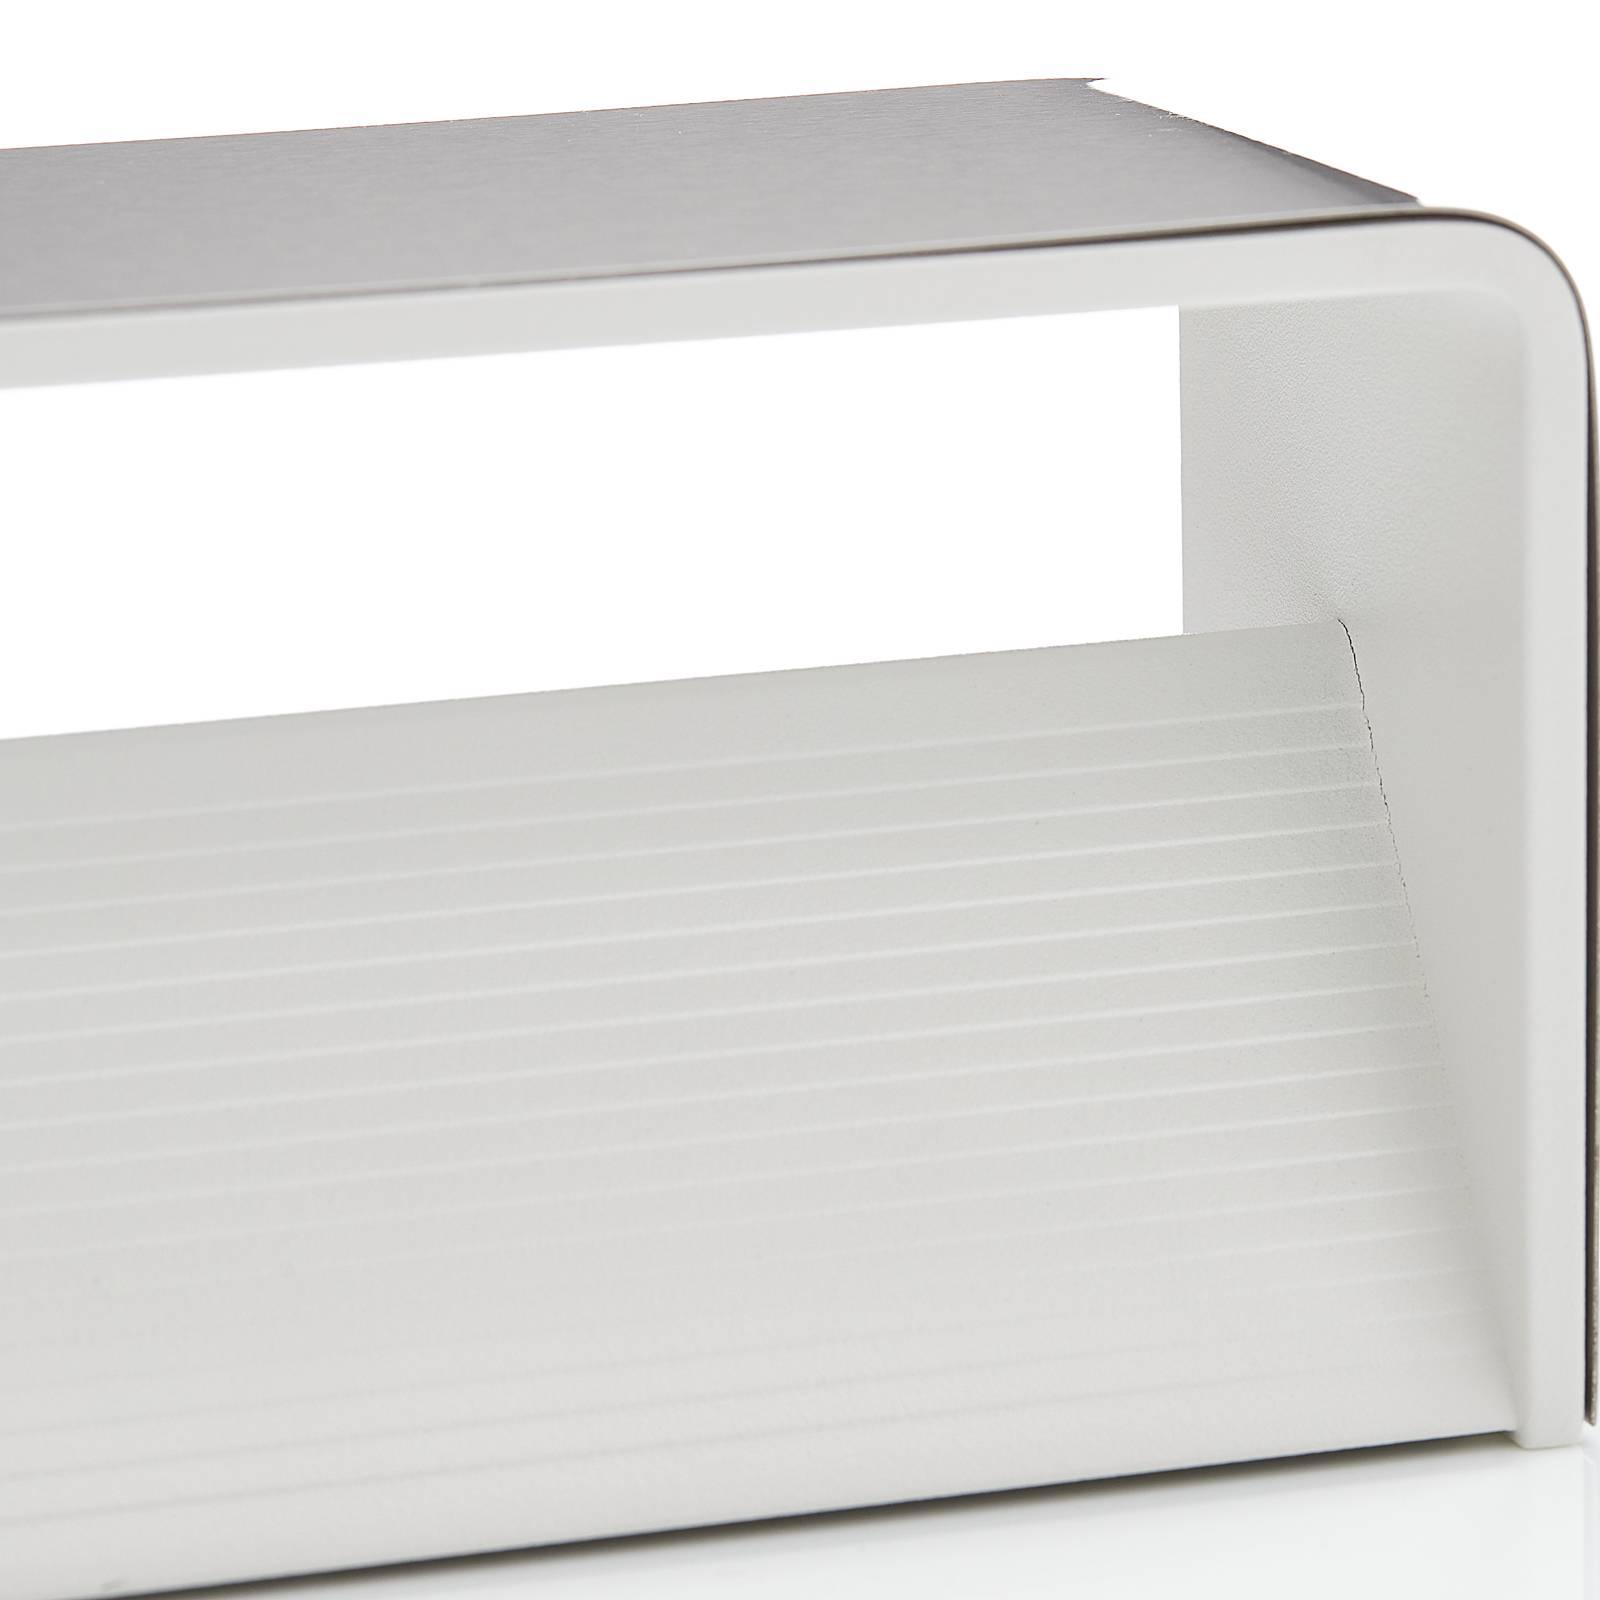 Lucande Sessa -LED-seinävalaisin 37 cm nikkeli